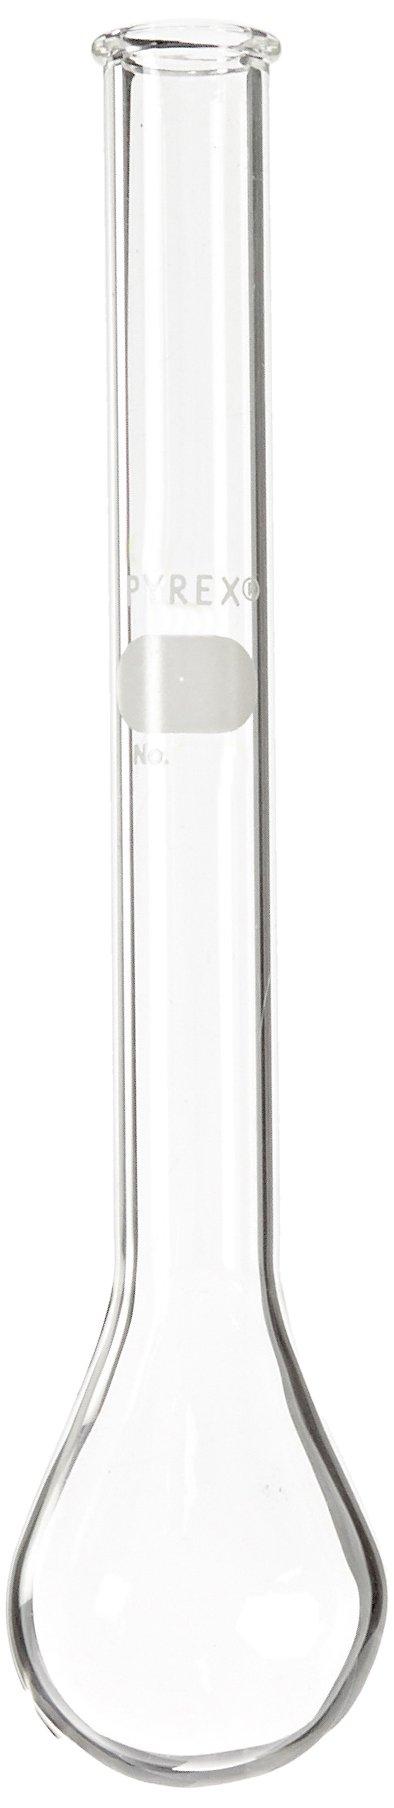 Corning Pyrex Borosilicate Glass Round Bottom Micro Kjeldahl Flask with Long Neck, 30ml Capacity (Case of 18)